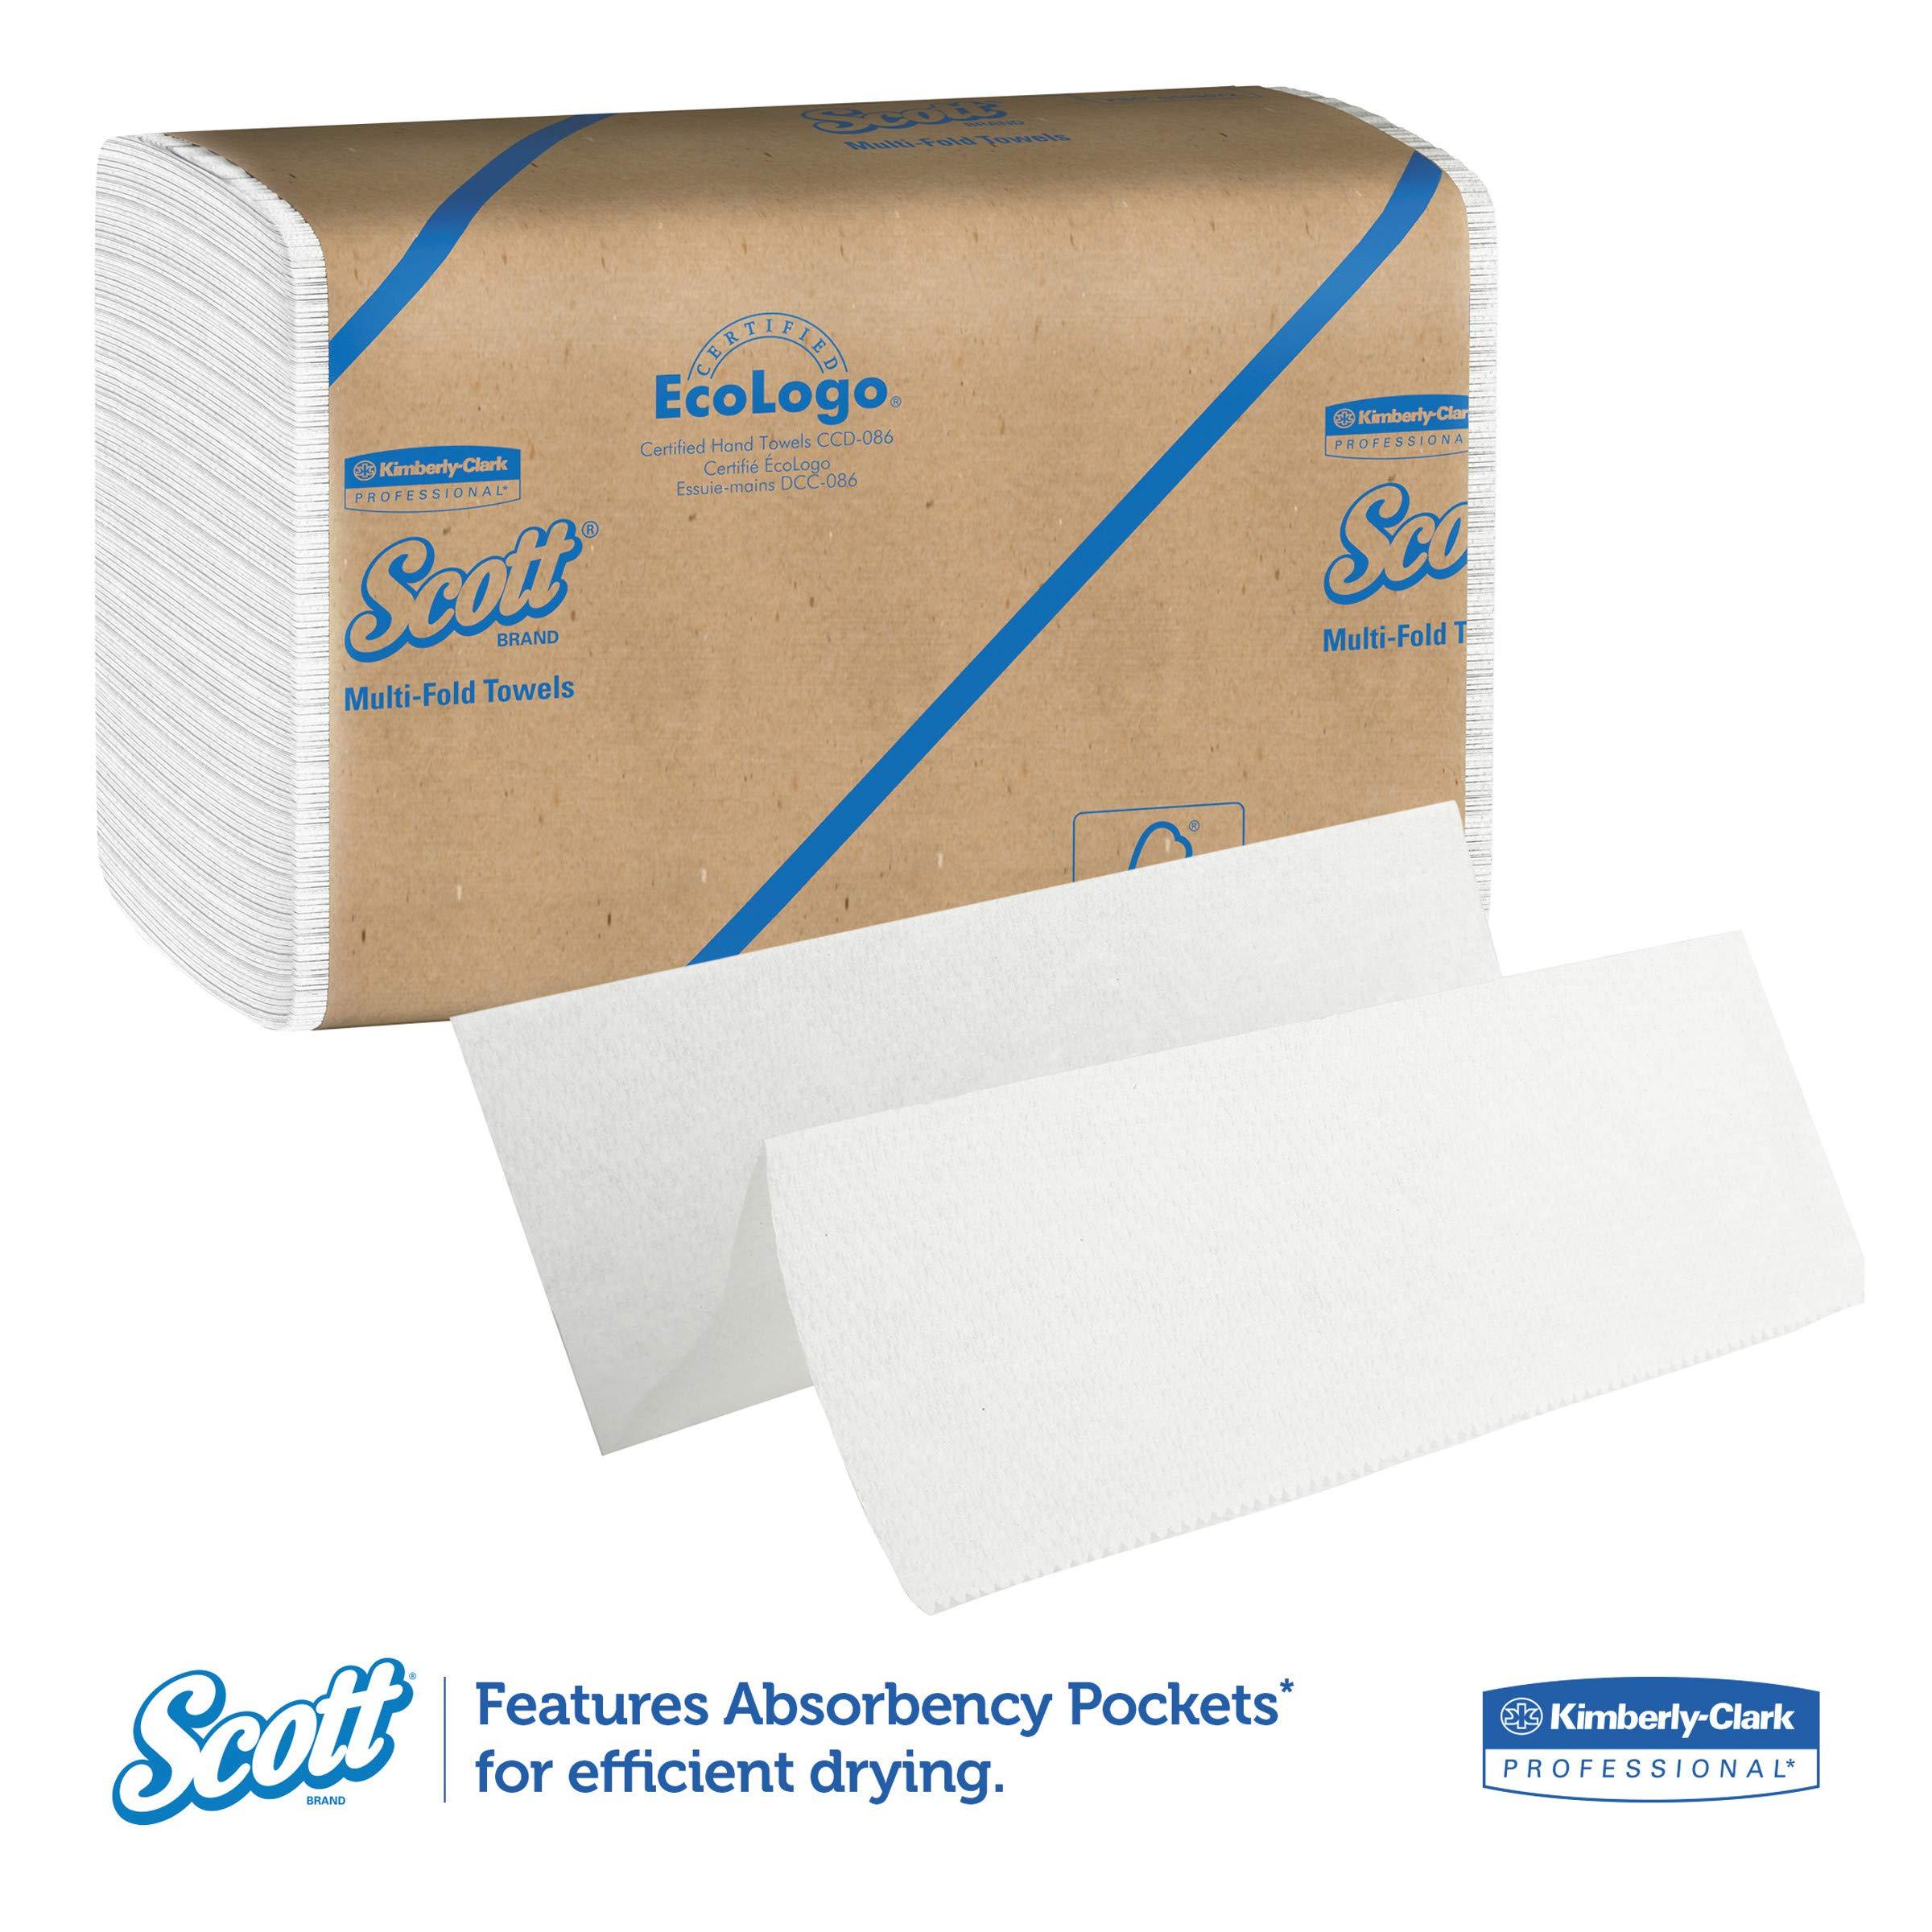 Scott 01840 Multi-Fold Towels, Absorbency Pockets, 9 1/5 x 9 2/5, 250 per Pack (Case of 16 Packs) by Scott (Image #2)